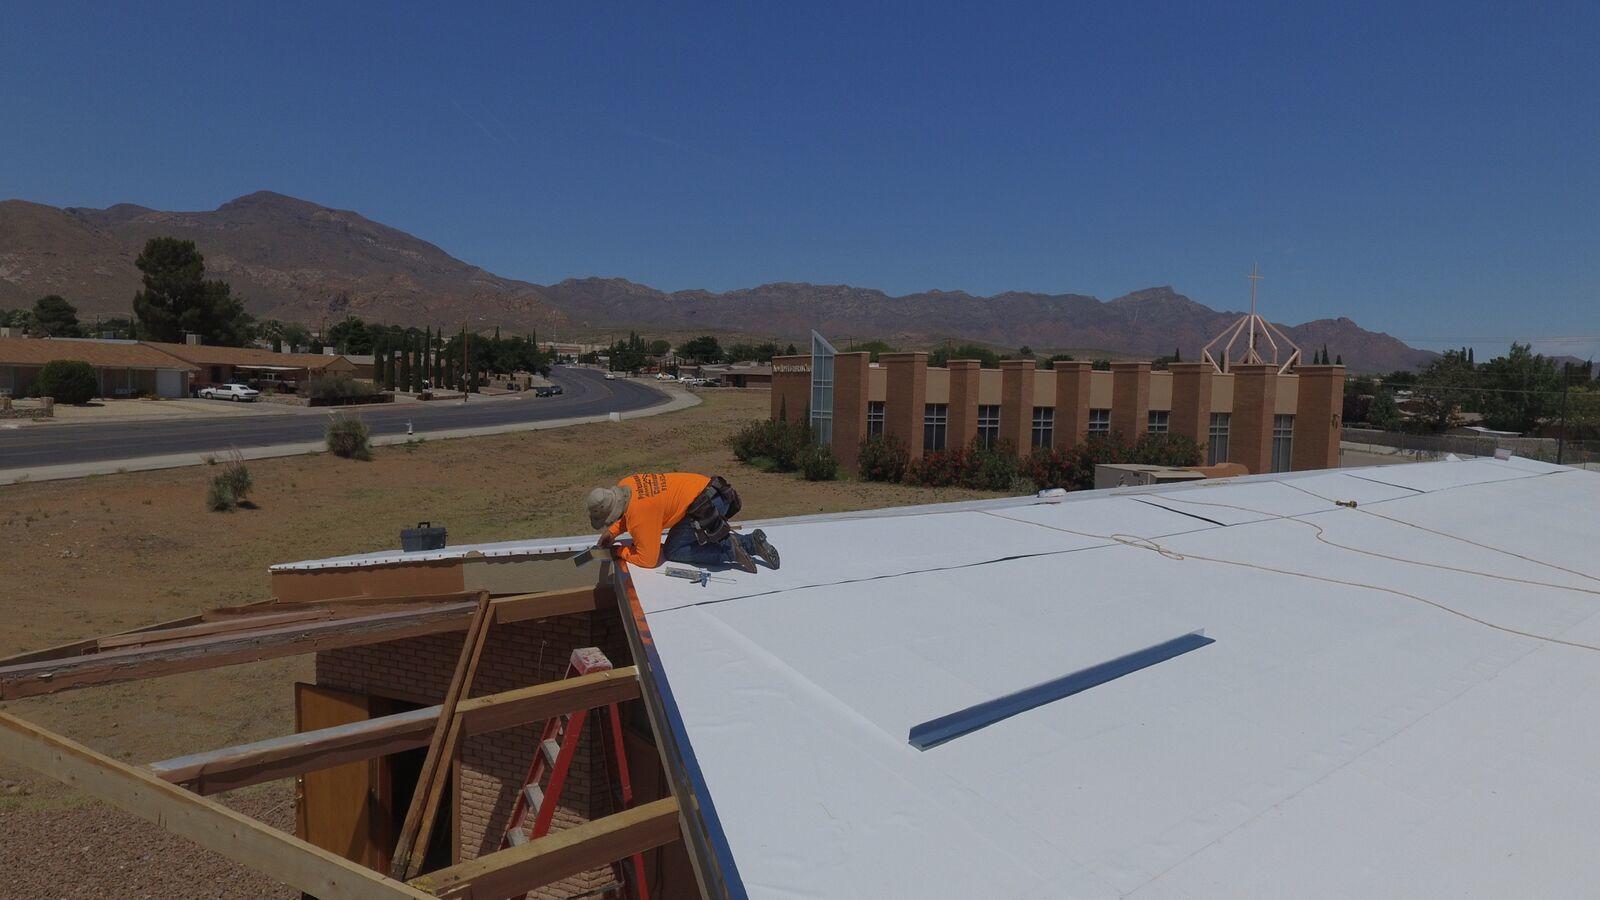 Professional Roofers & Contractors image 2